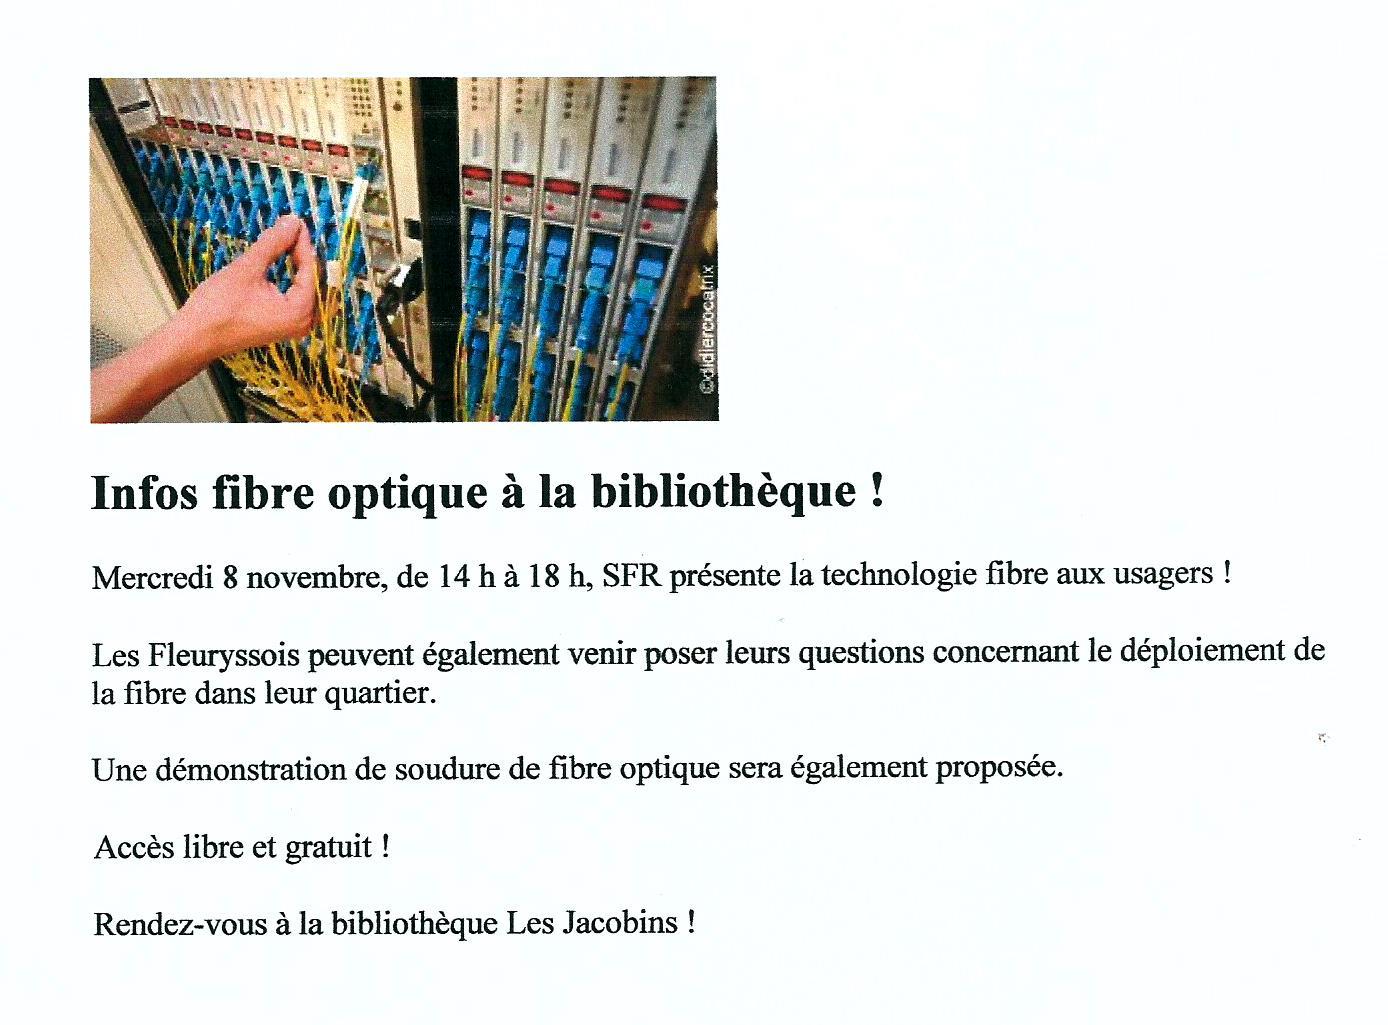 Scan Infos fibre à la Bibliothèque ! 2017 (08.11.2017).jpg